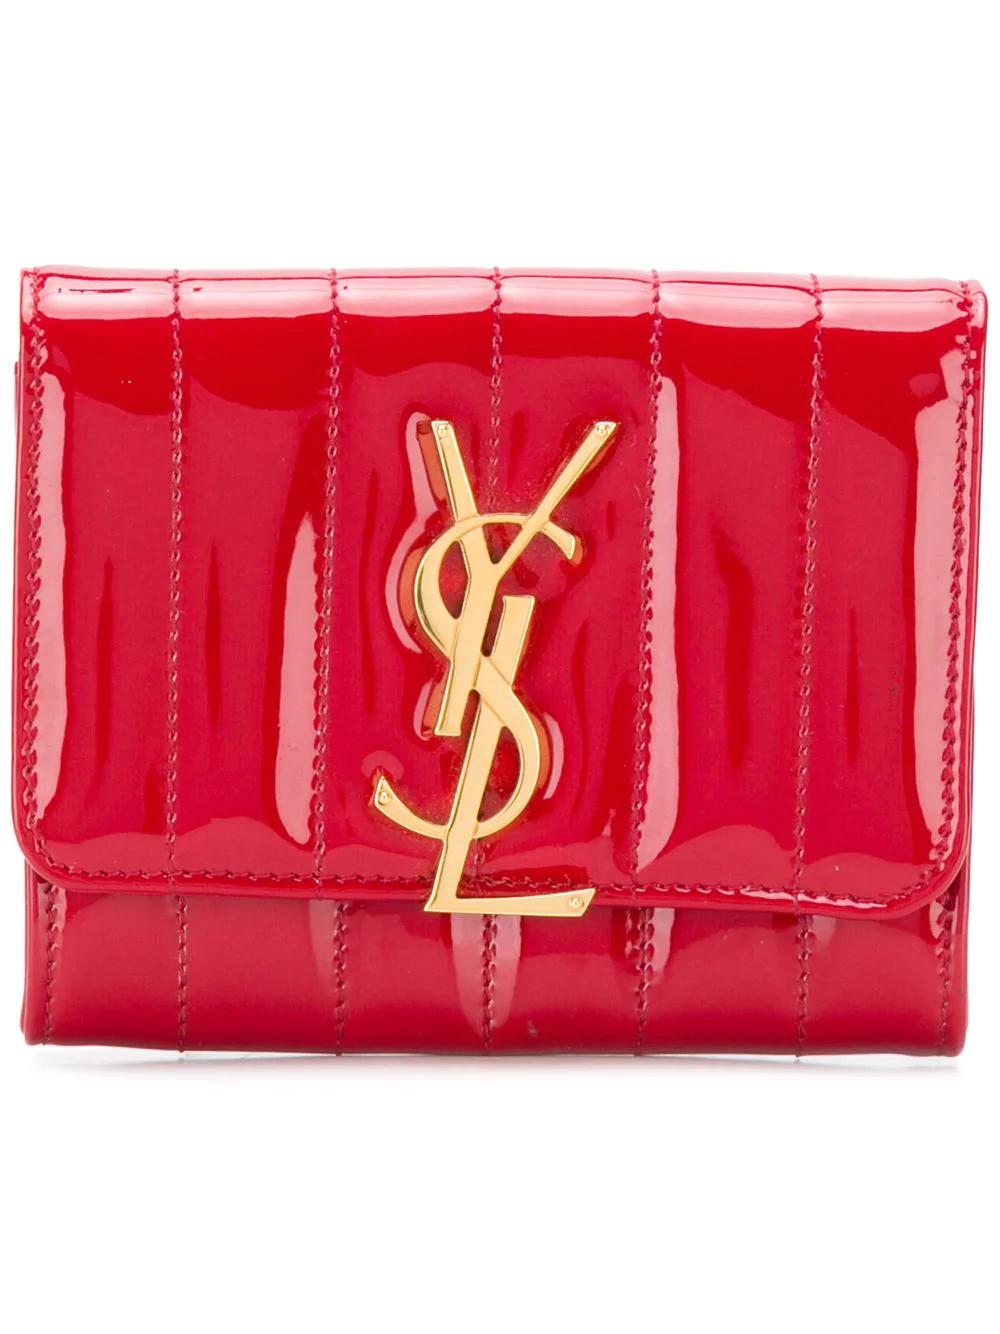 c836b581c0f11 Saint Laurent Kleines  Vicky  Portemonnaie - Rot In Red